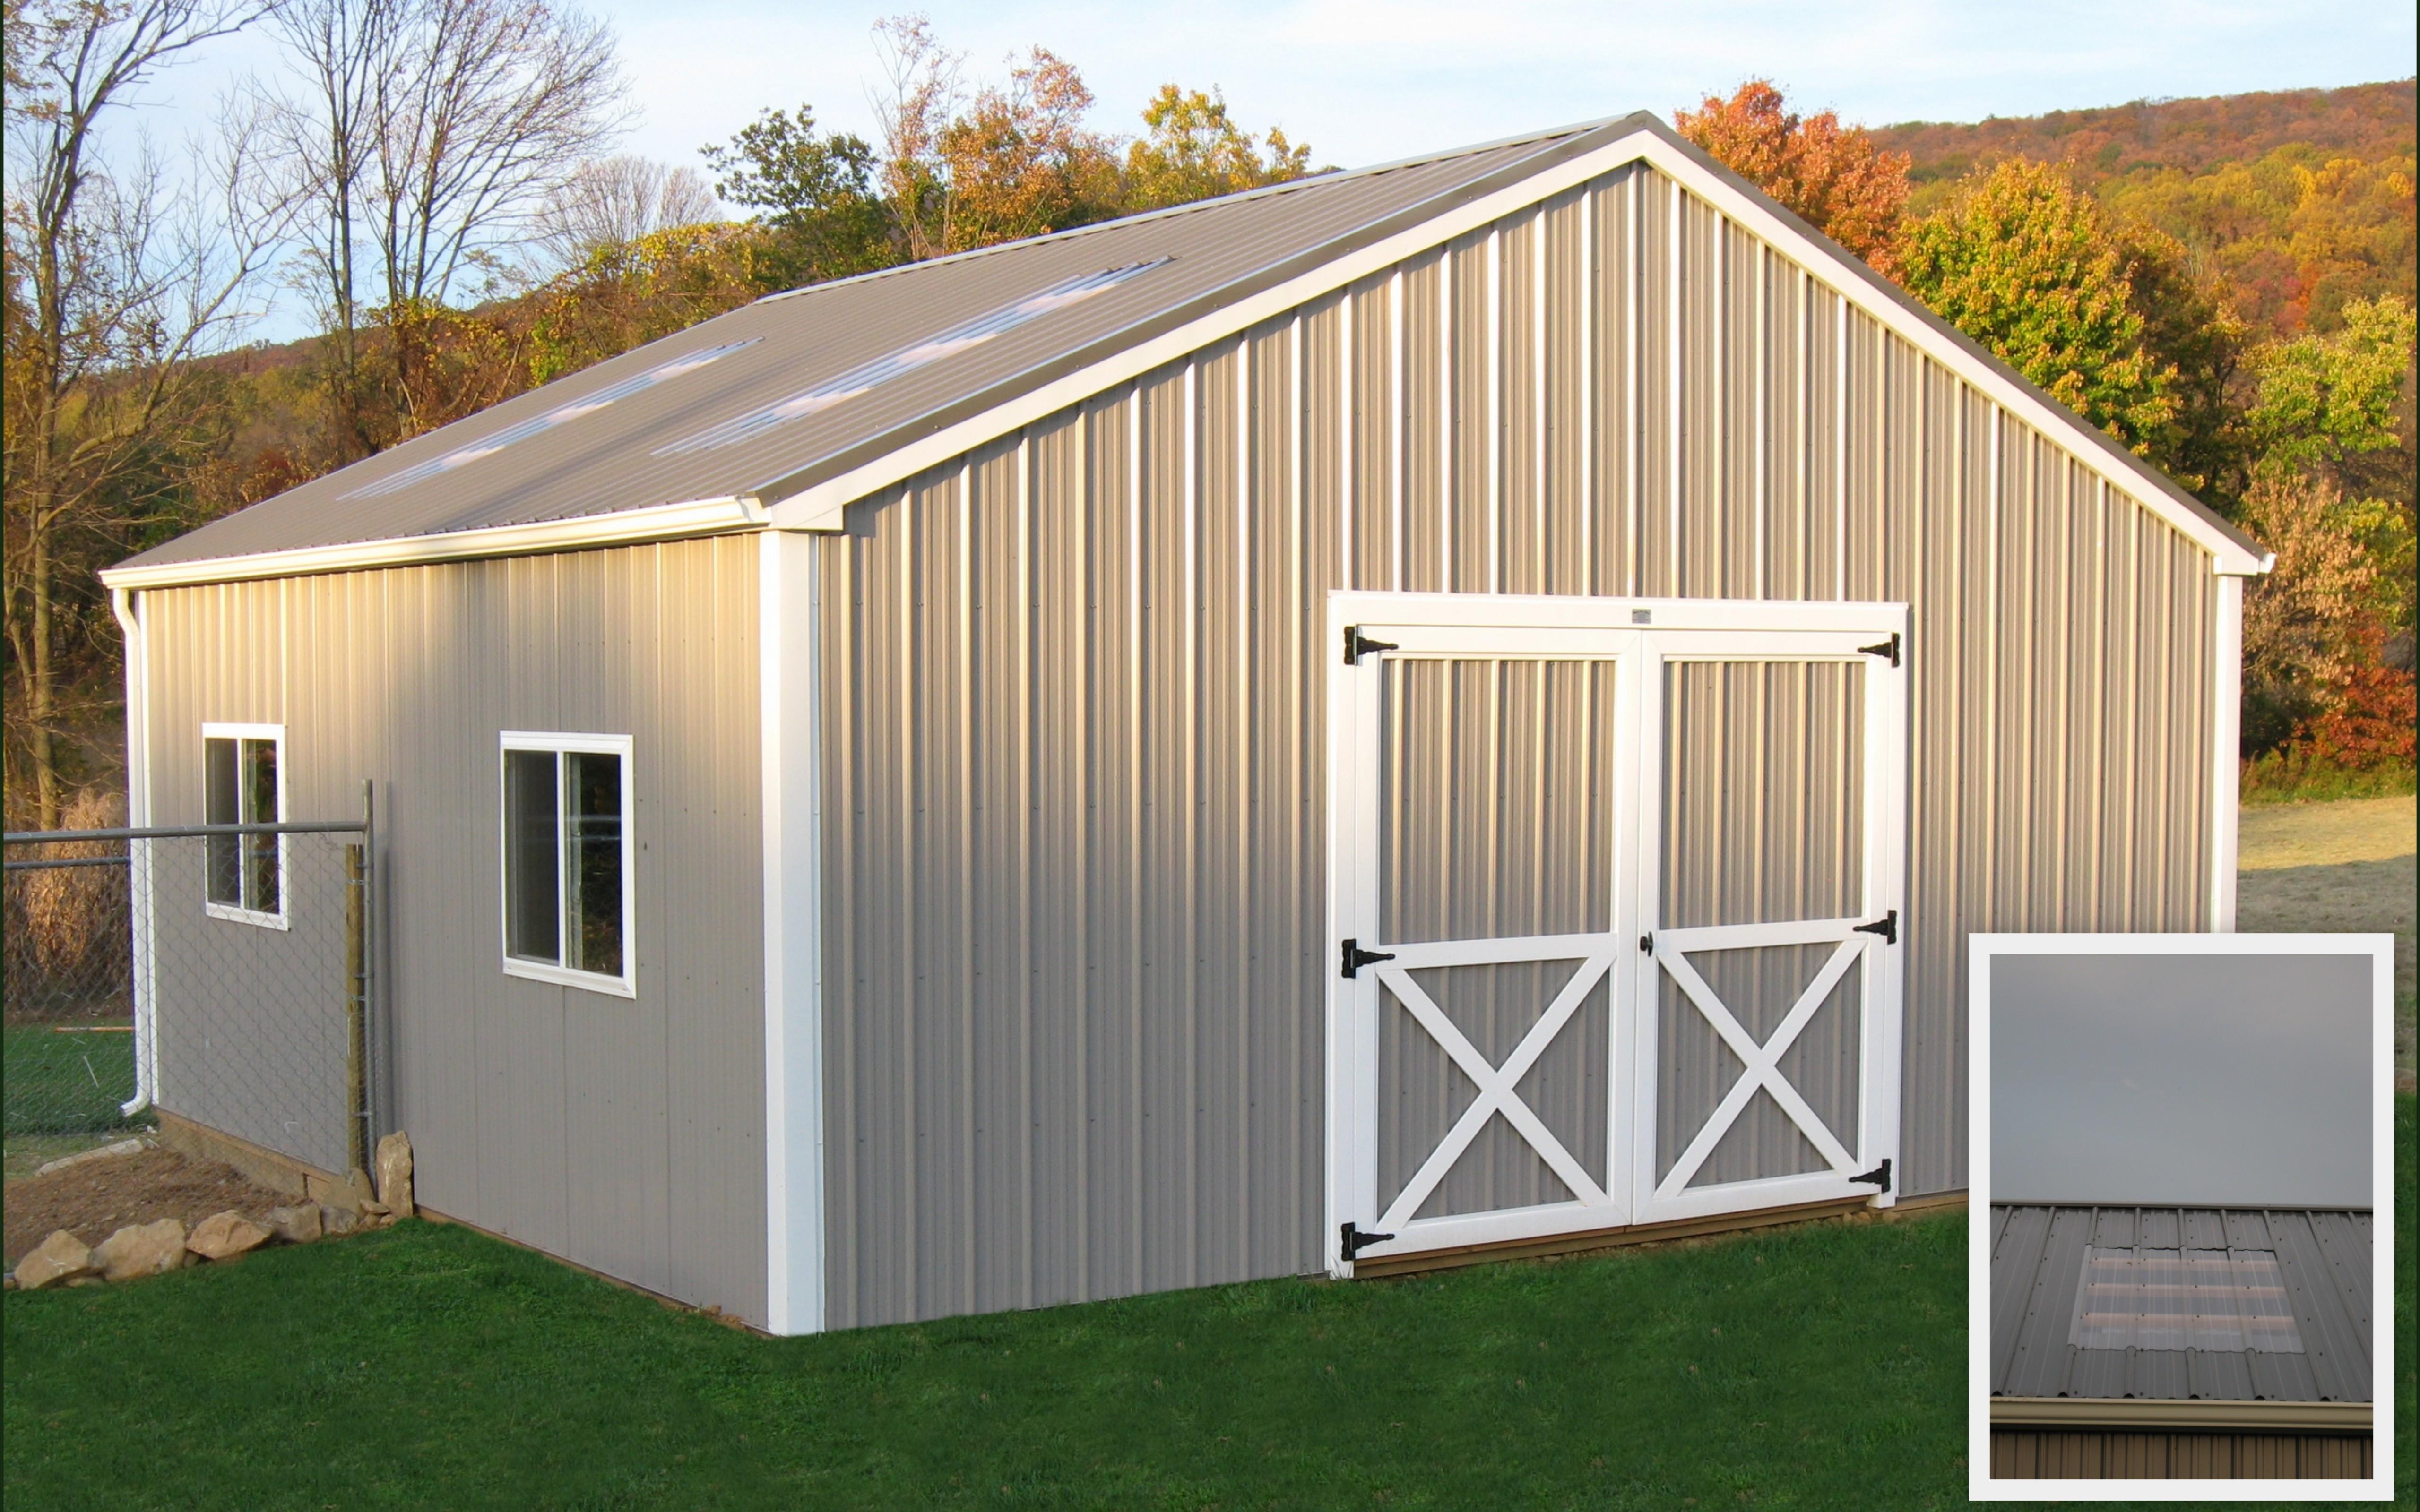 24 X 24 Livestock Pole Building Myers Barn Shop